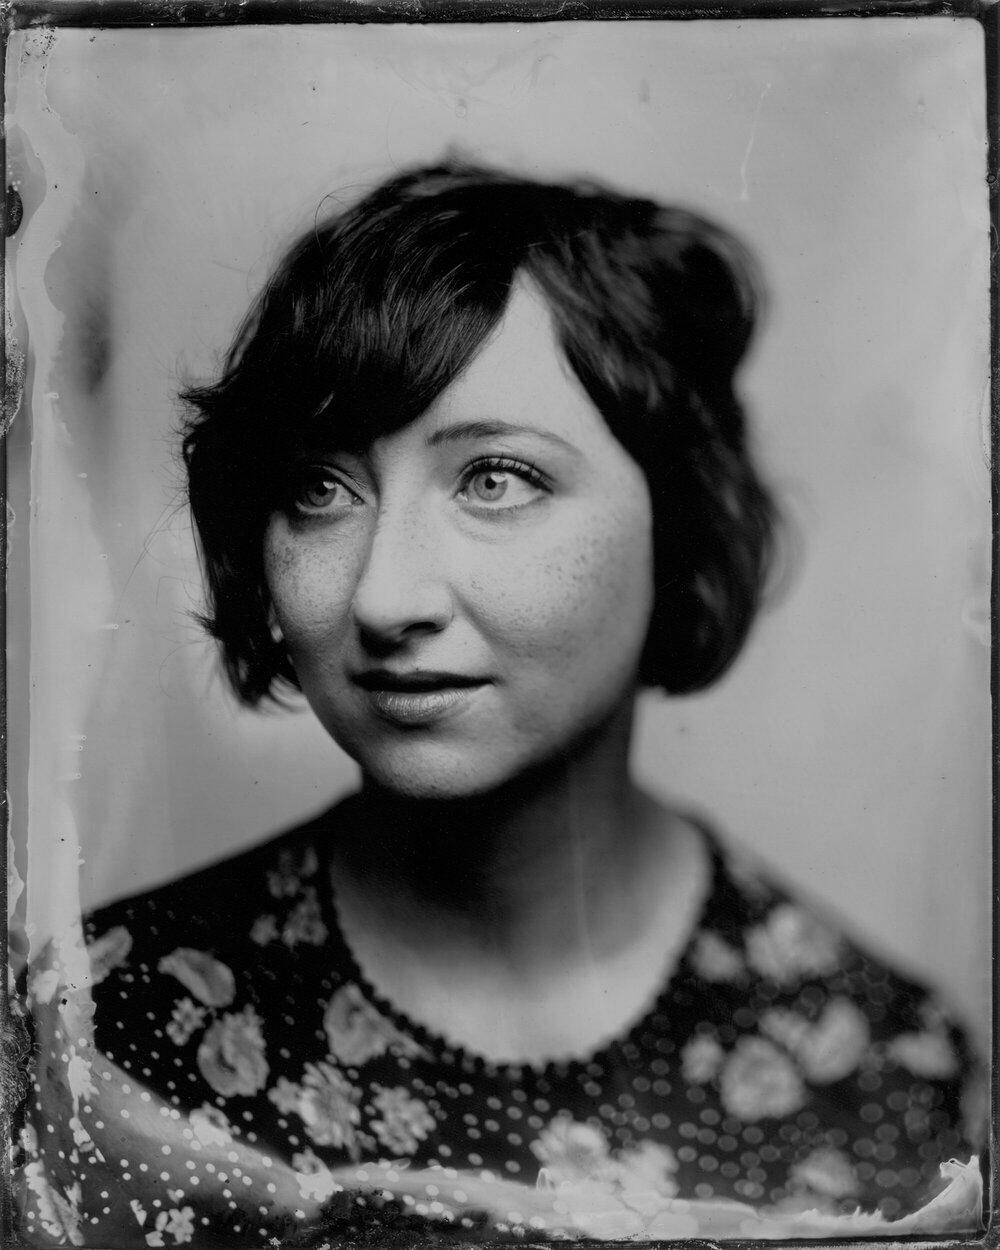 Tamara Harper, Artist / Embroiderer